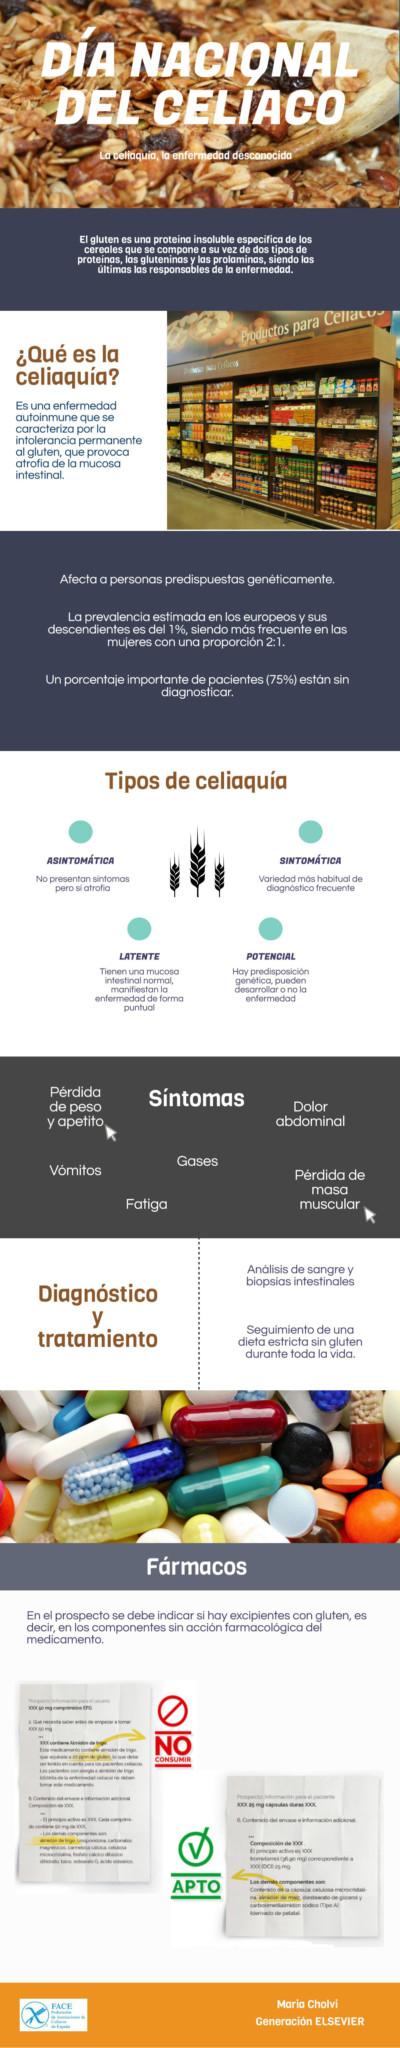 Dia-Nacional-del-Celiaco-1.jpeg